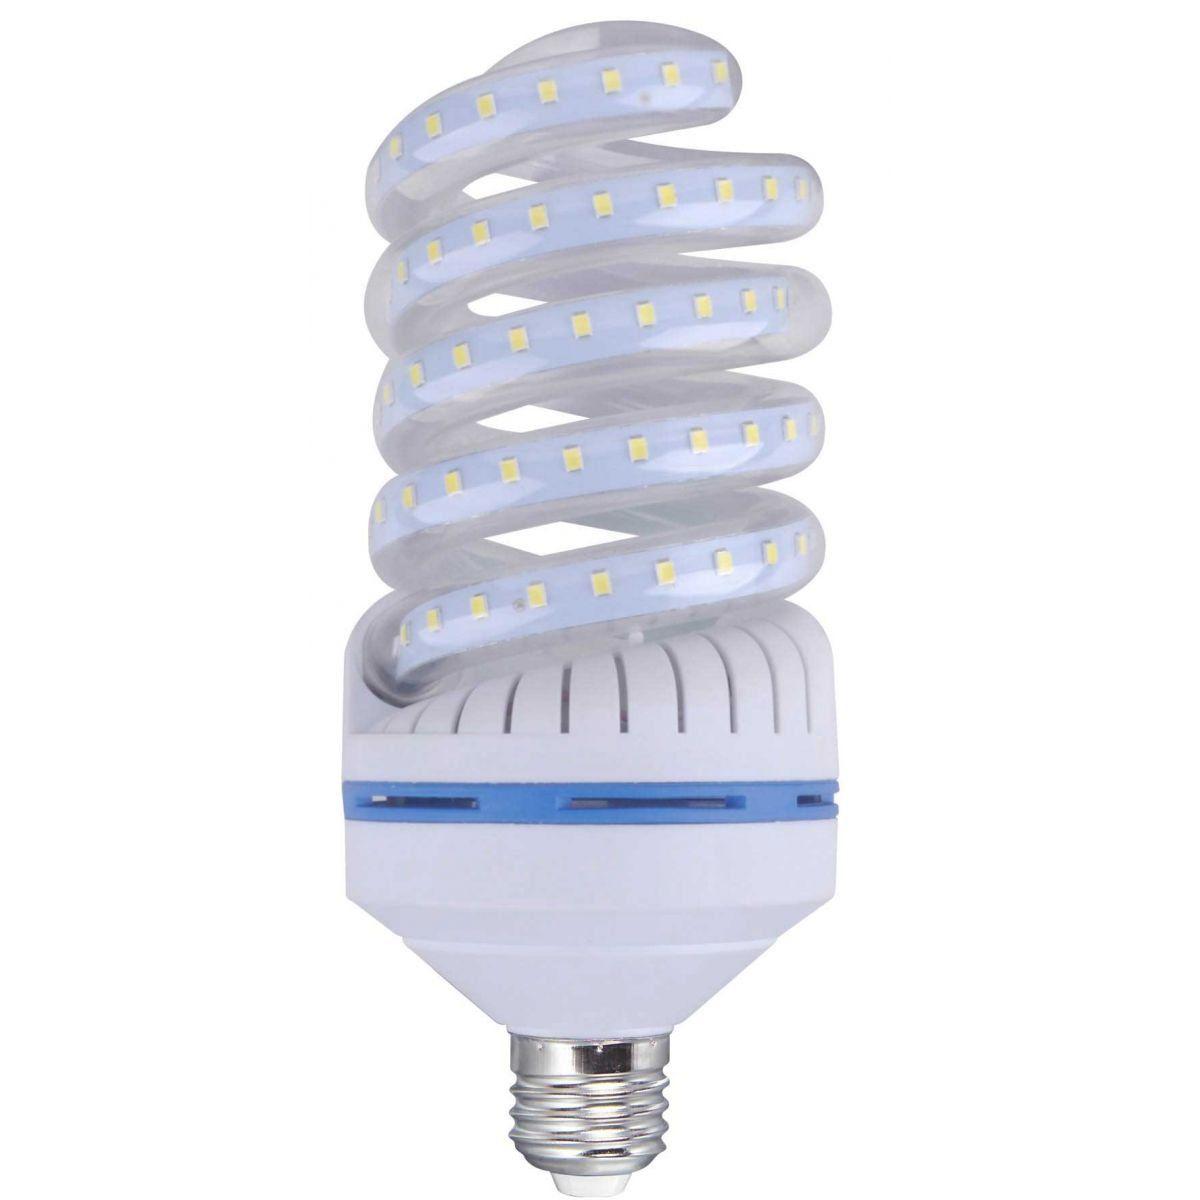 LAMPADA LED COMPACTA ESPIRAL 12W E27 BIVOLT - BRANCO FRIO 6000K